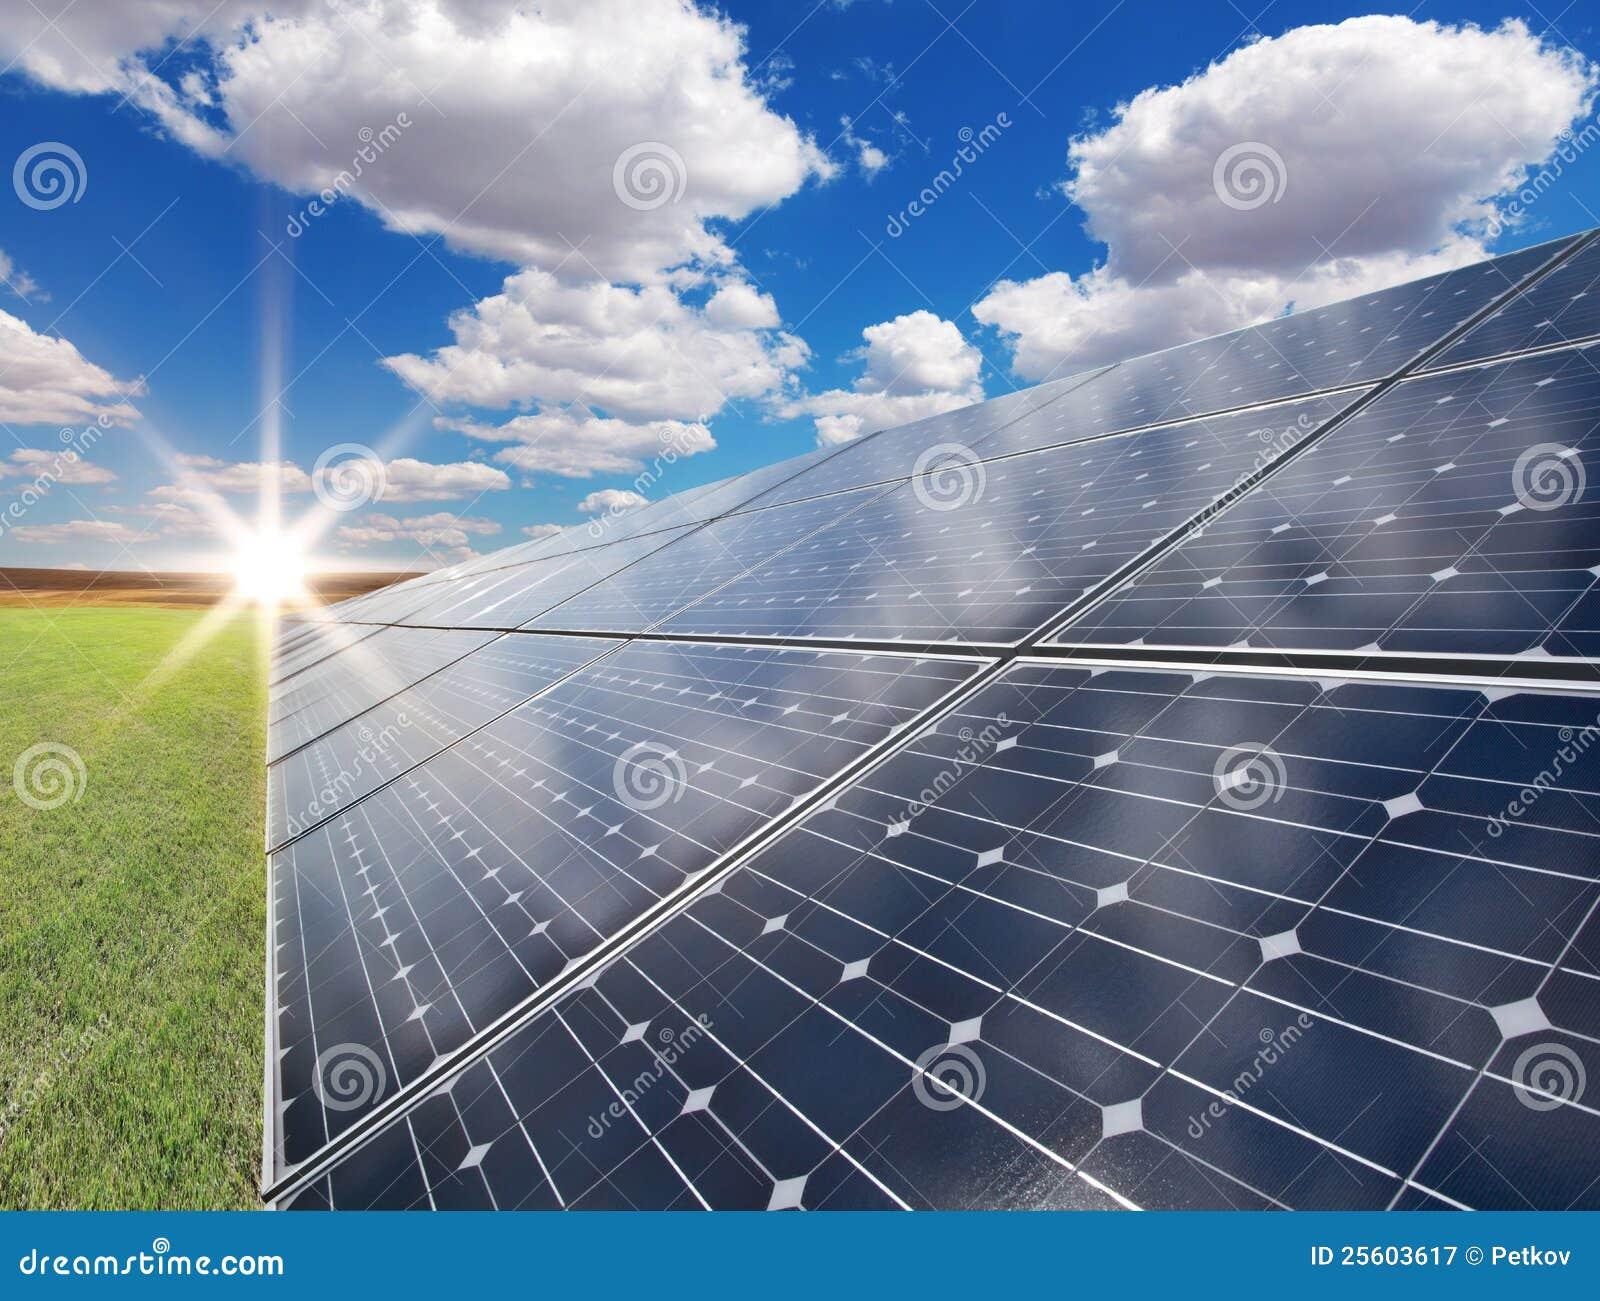 Solar Power Station Photovoltaics Royalty Free Stock